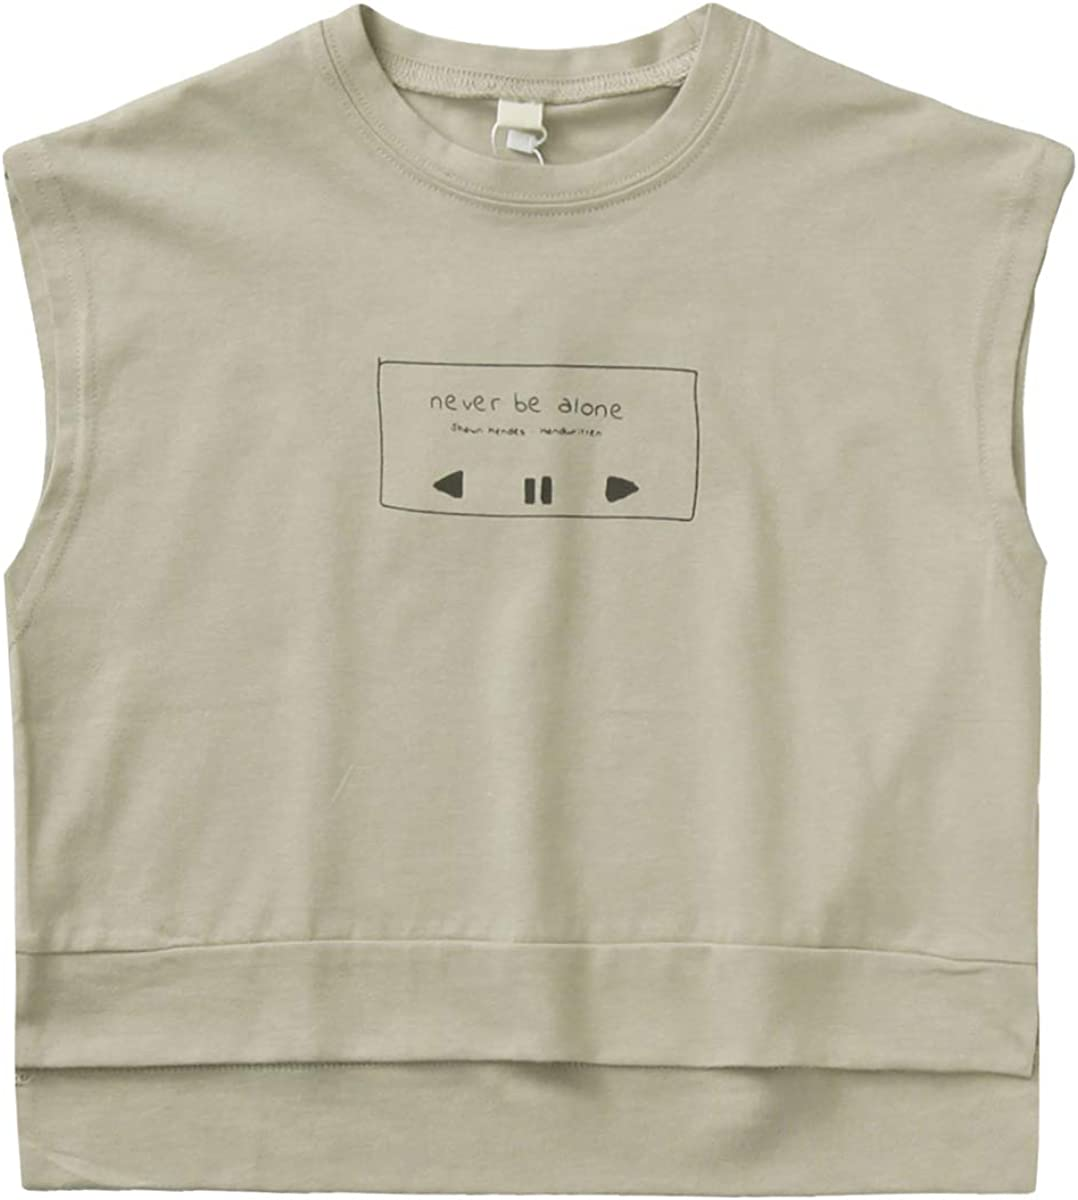 Toddler Kids Boys'Tank Tops Printed Sleeveless T-Shirts Cartoon Pattern Summer Tee